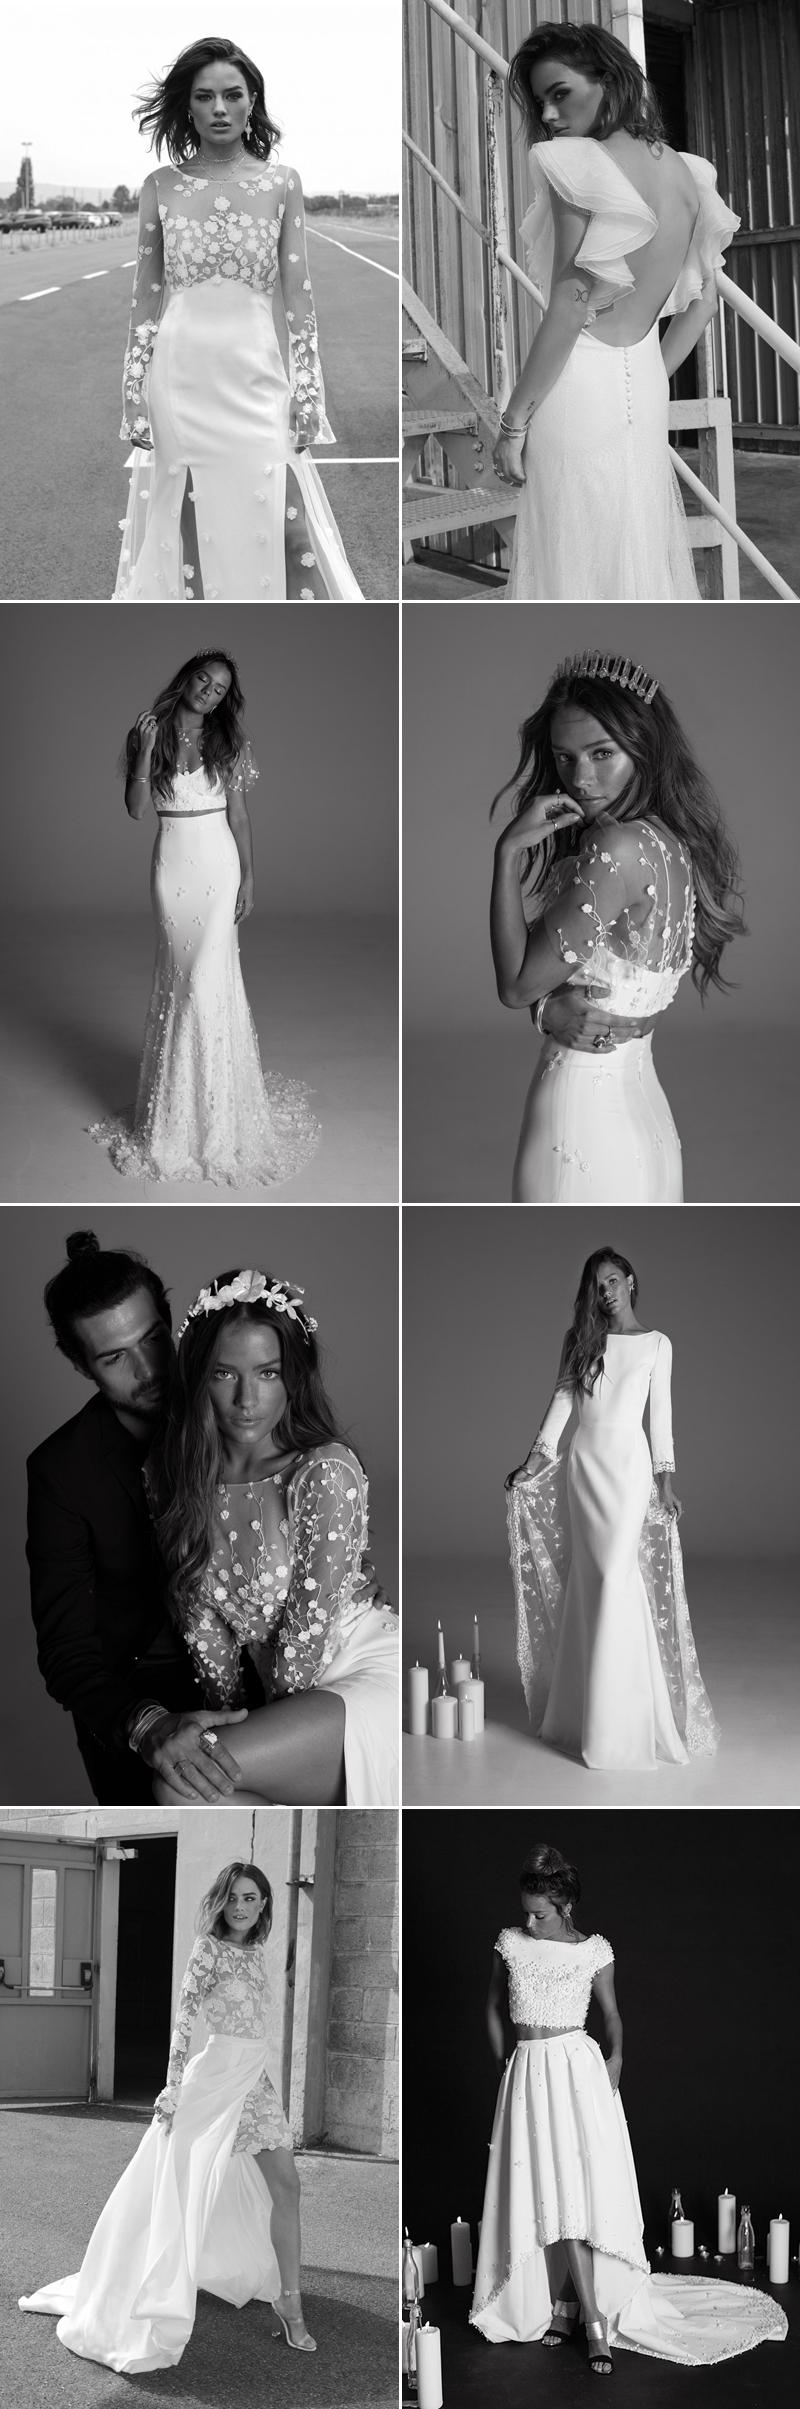 fashion-forward-weddingdress04-RimeArodaky